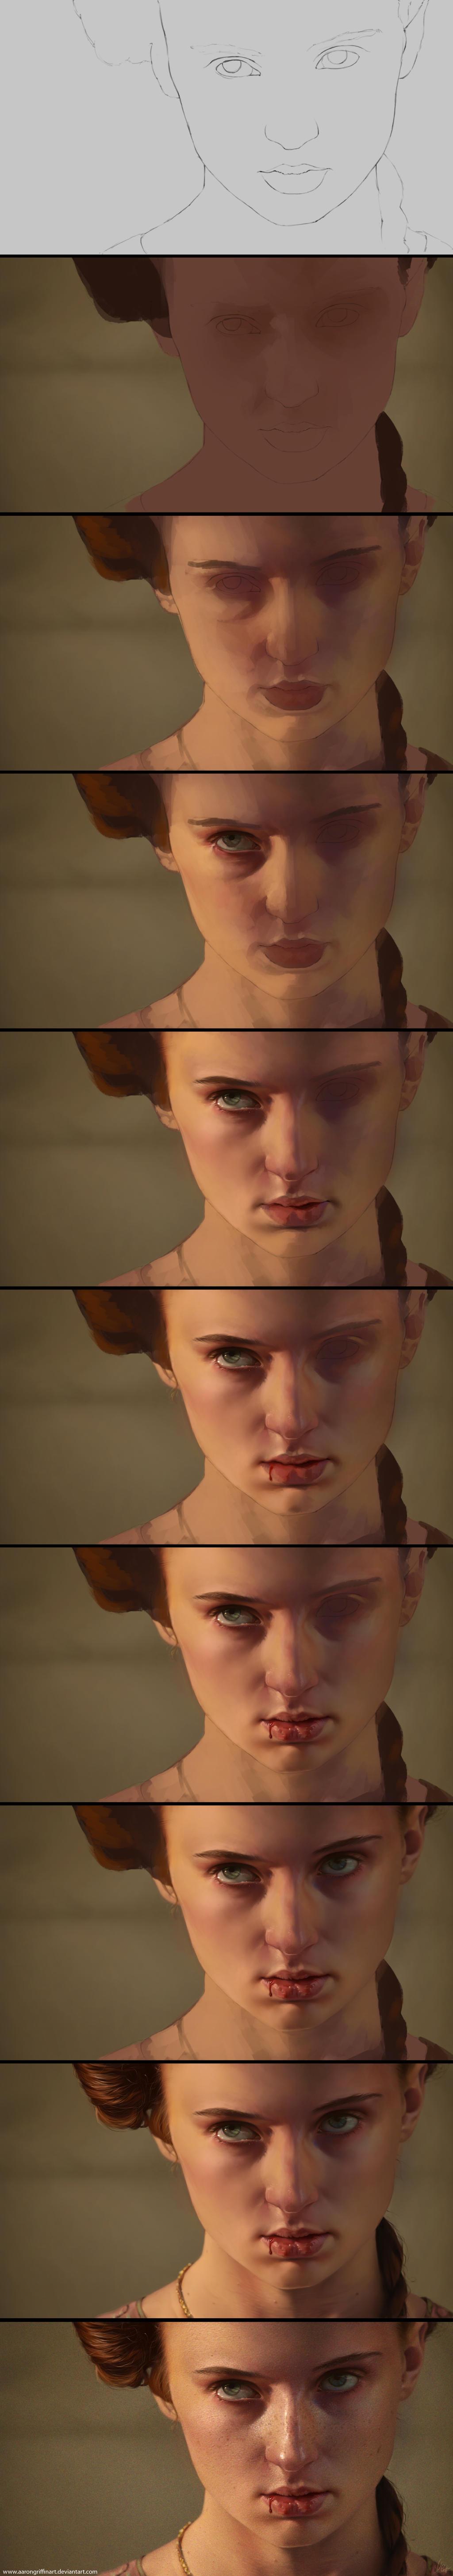 Sansa - Game of Thrones Process